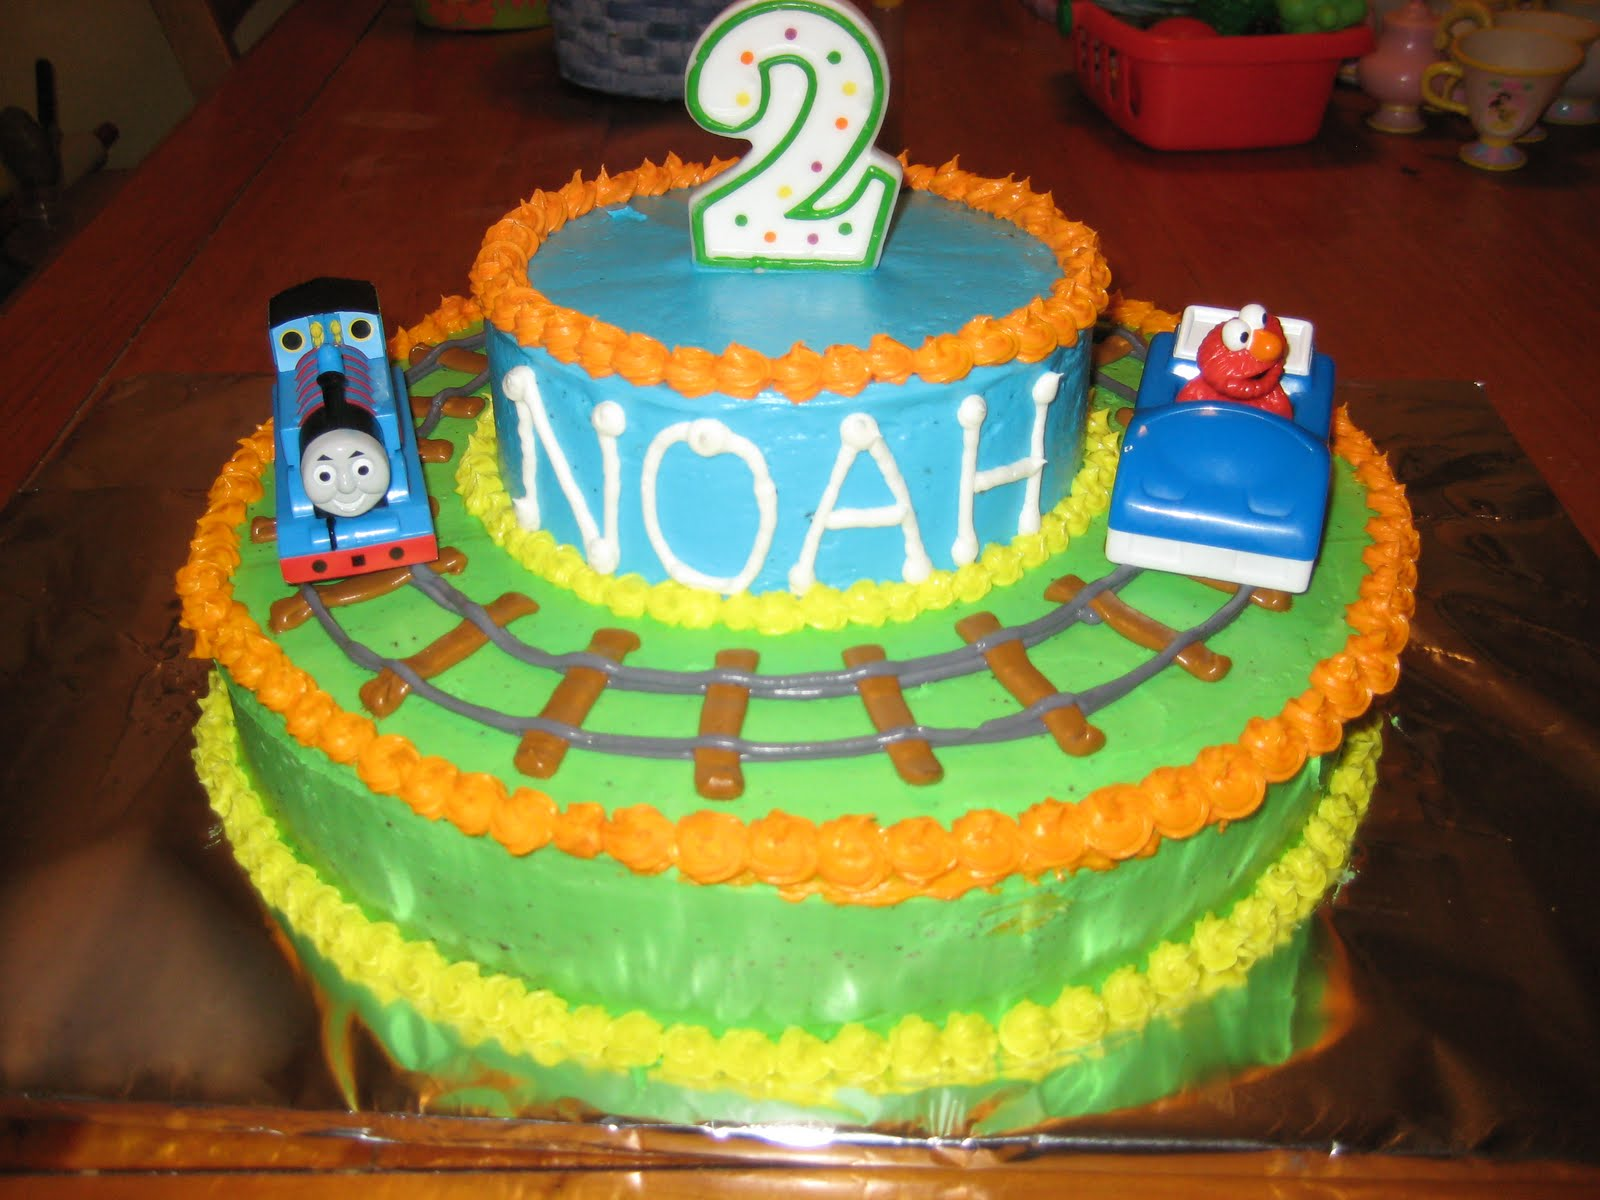 Noah Had His 2 Favorites On 2nd Birthday Cake Thomas The Train Elmo